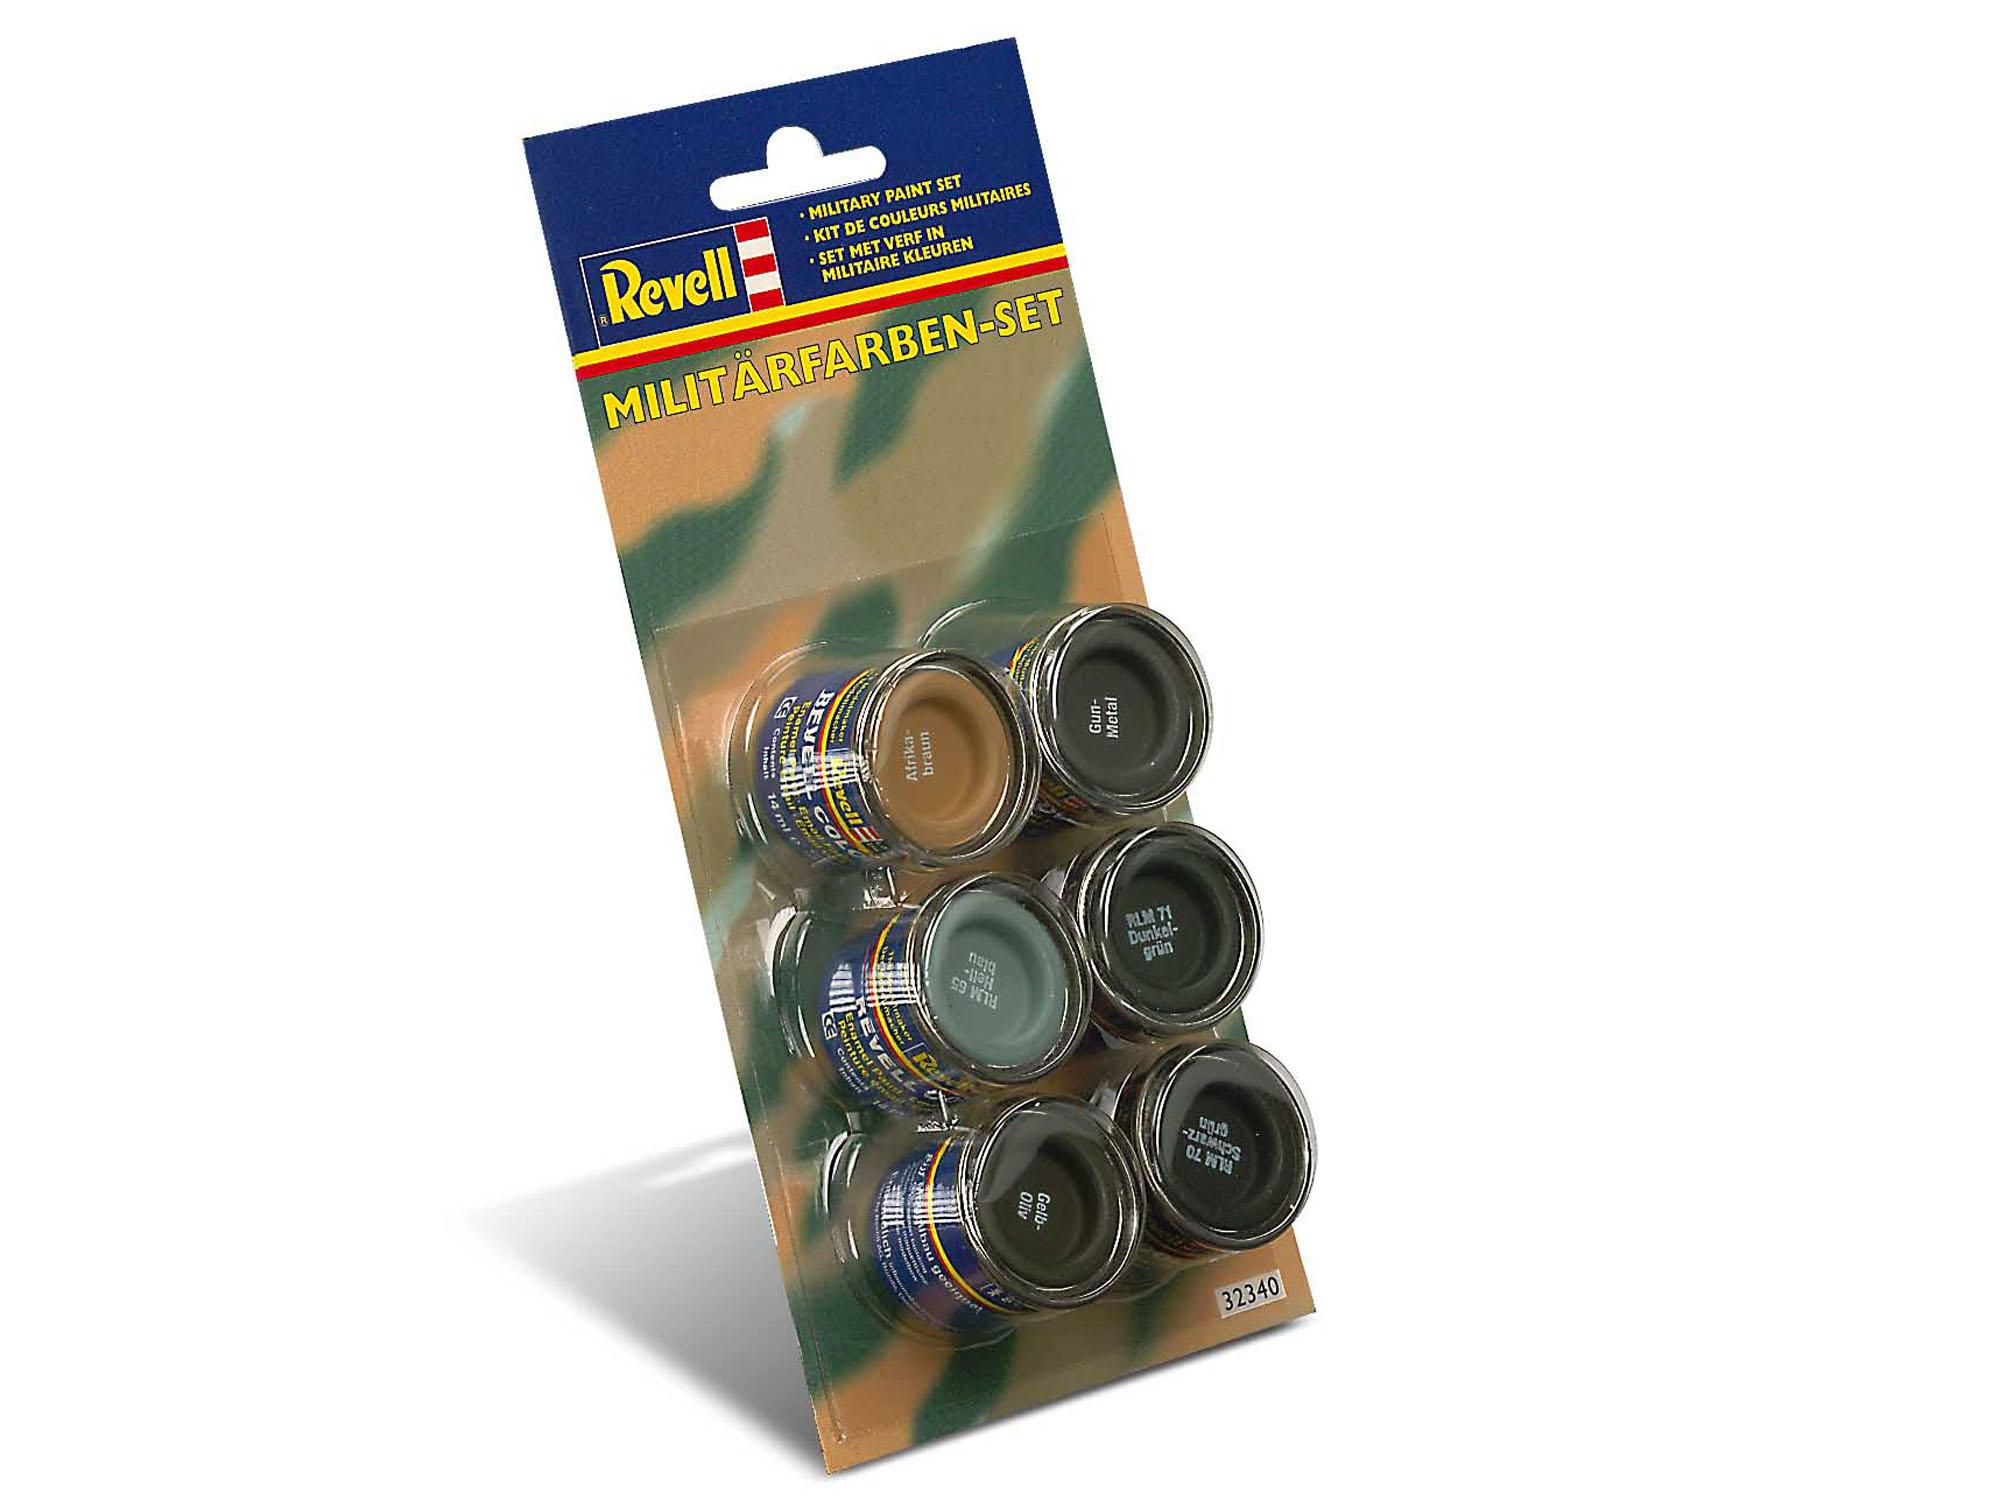 Revell 32340 Militärfarben-Set  6 x 14 ml